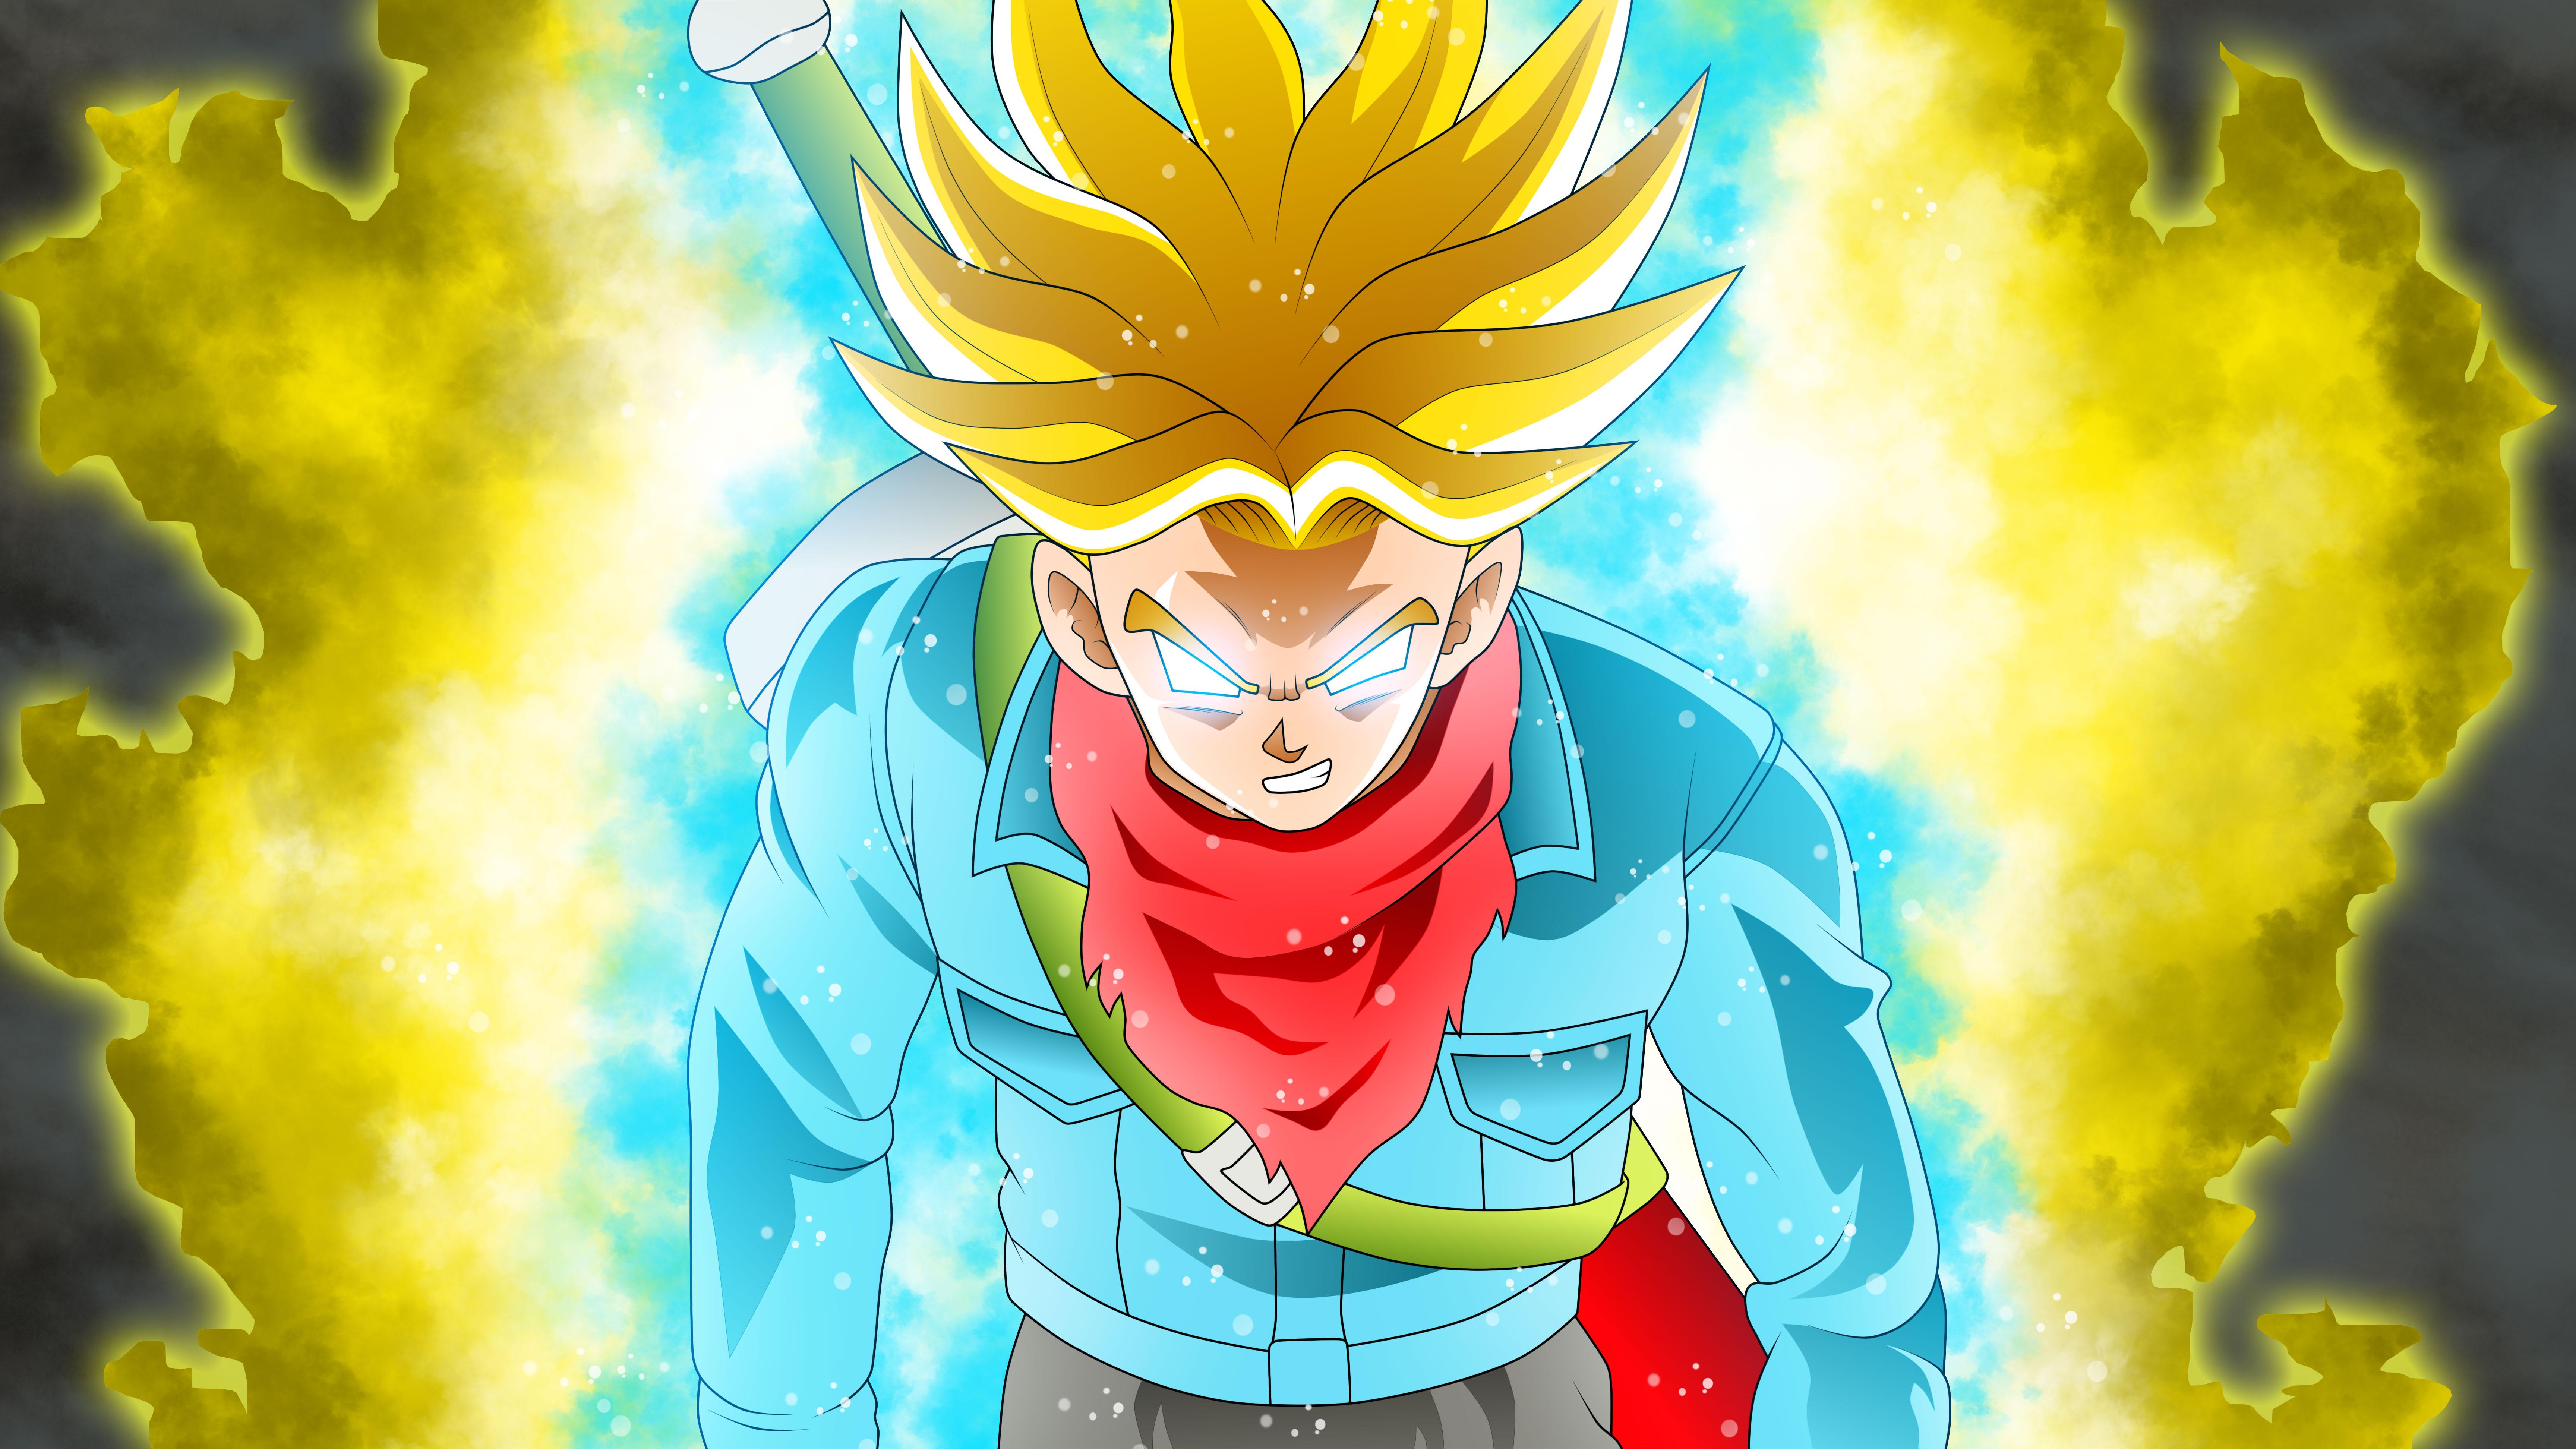 Dragon Ball Super Hd Wallpaper: Trunks Dragon Ball Super, HD Anime, 4k Wallpapers, Images